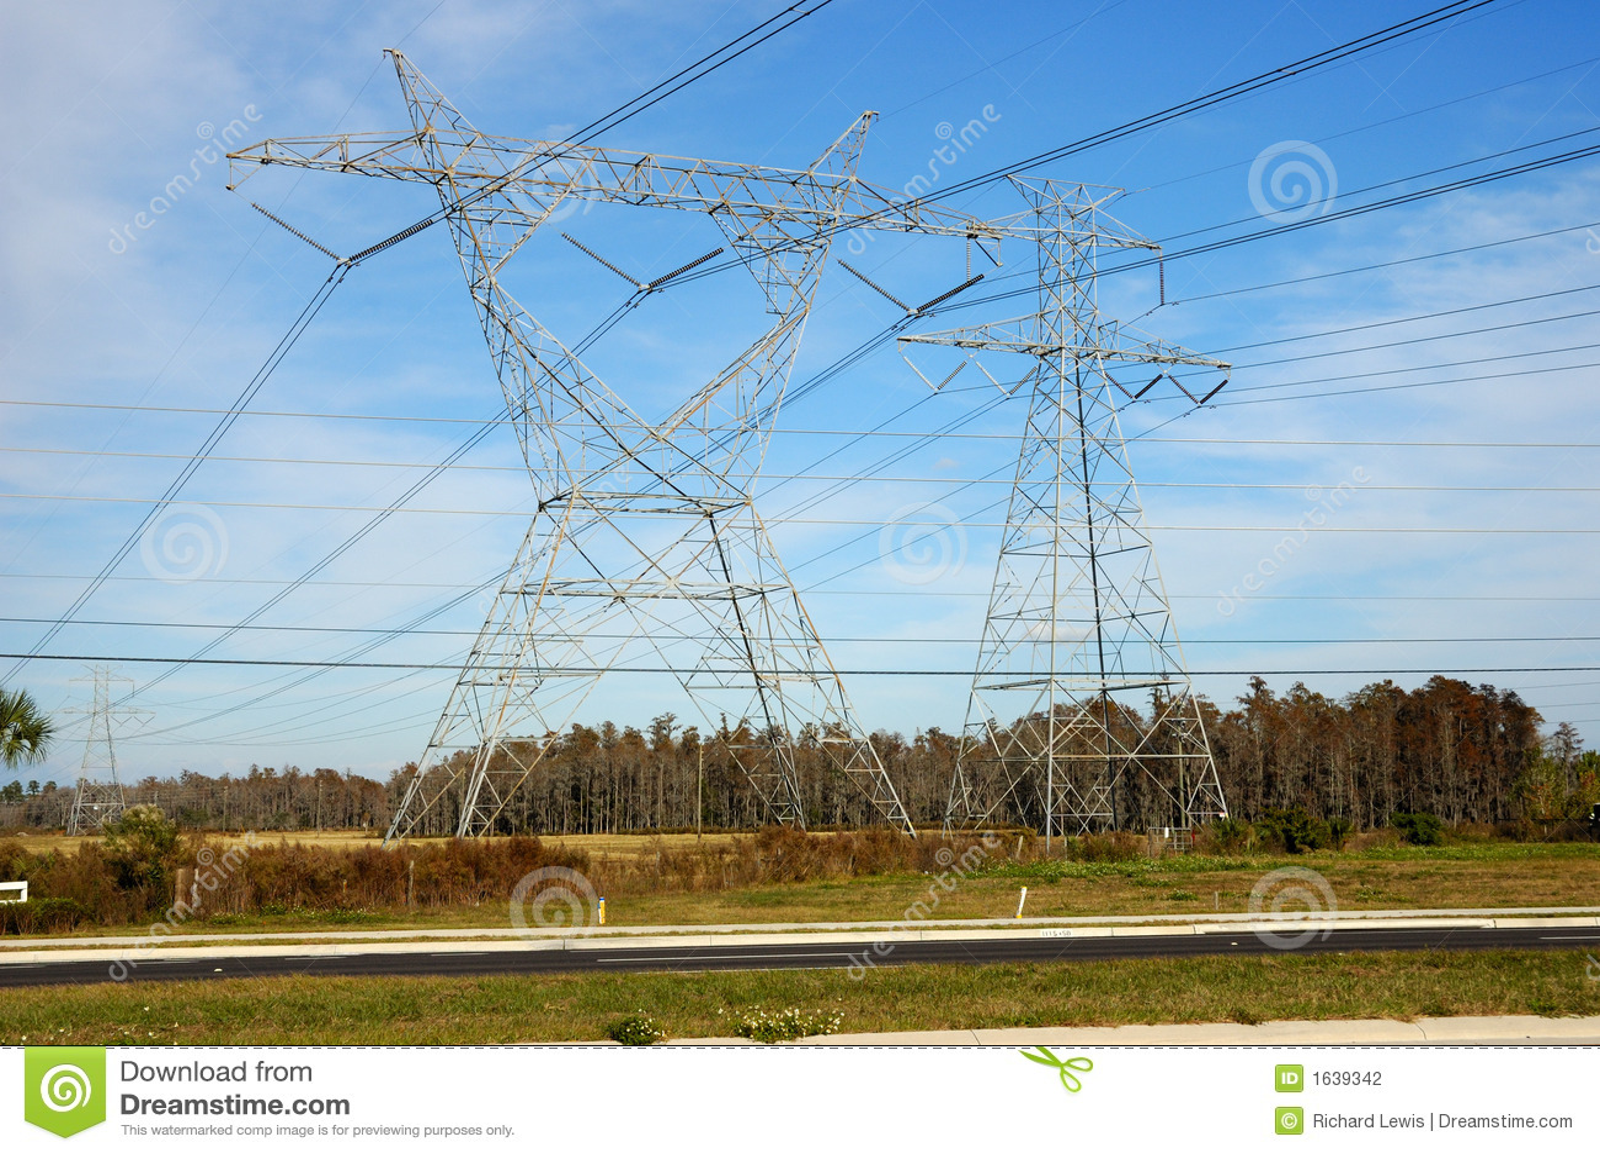 High Voltage Power Lines : High voltage power lines stock photography image